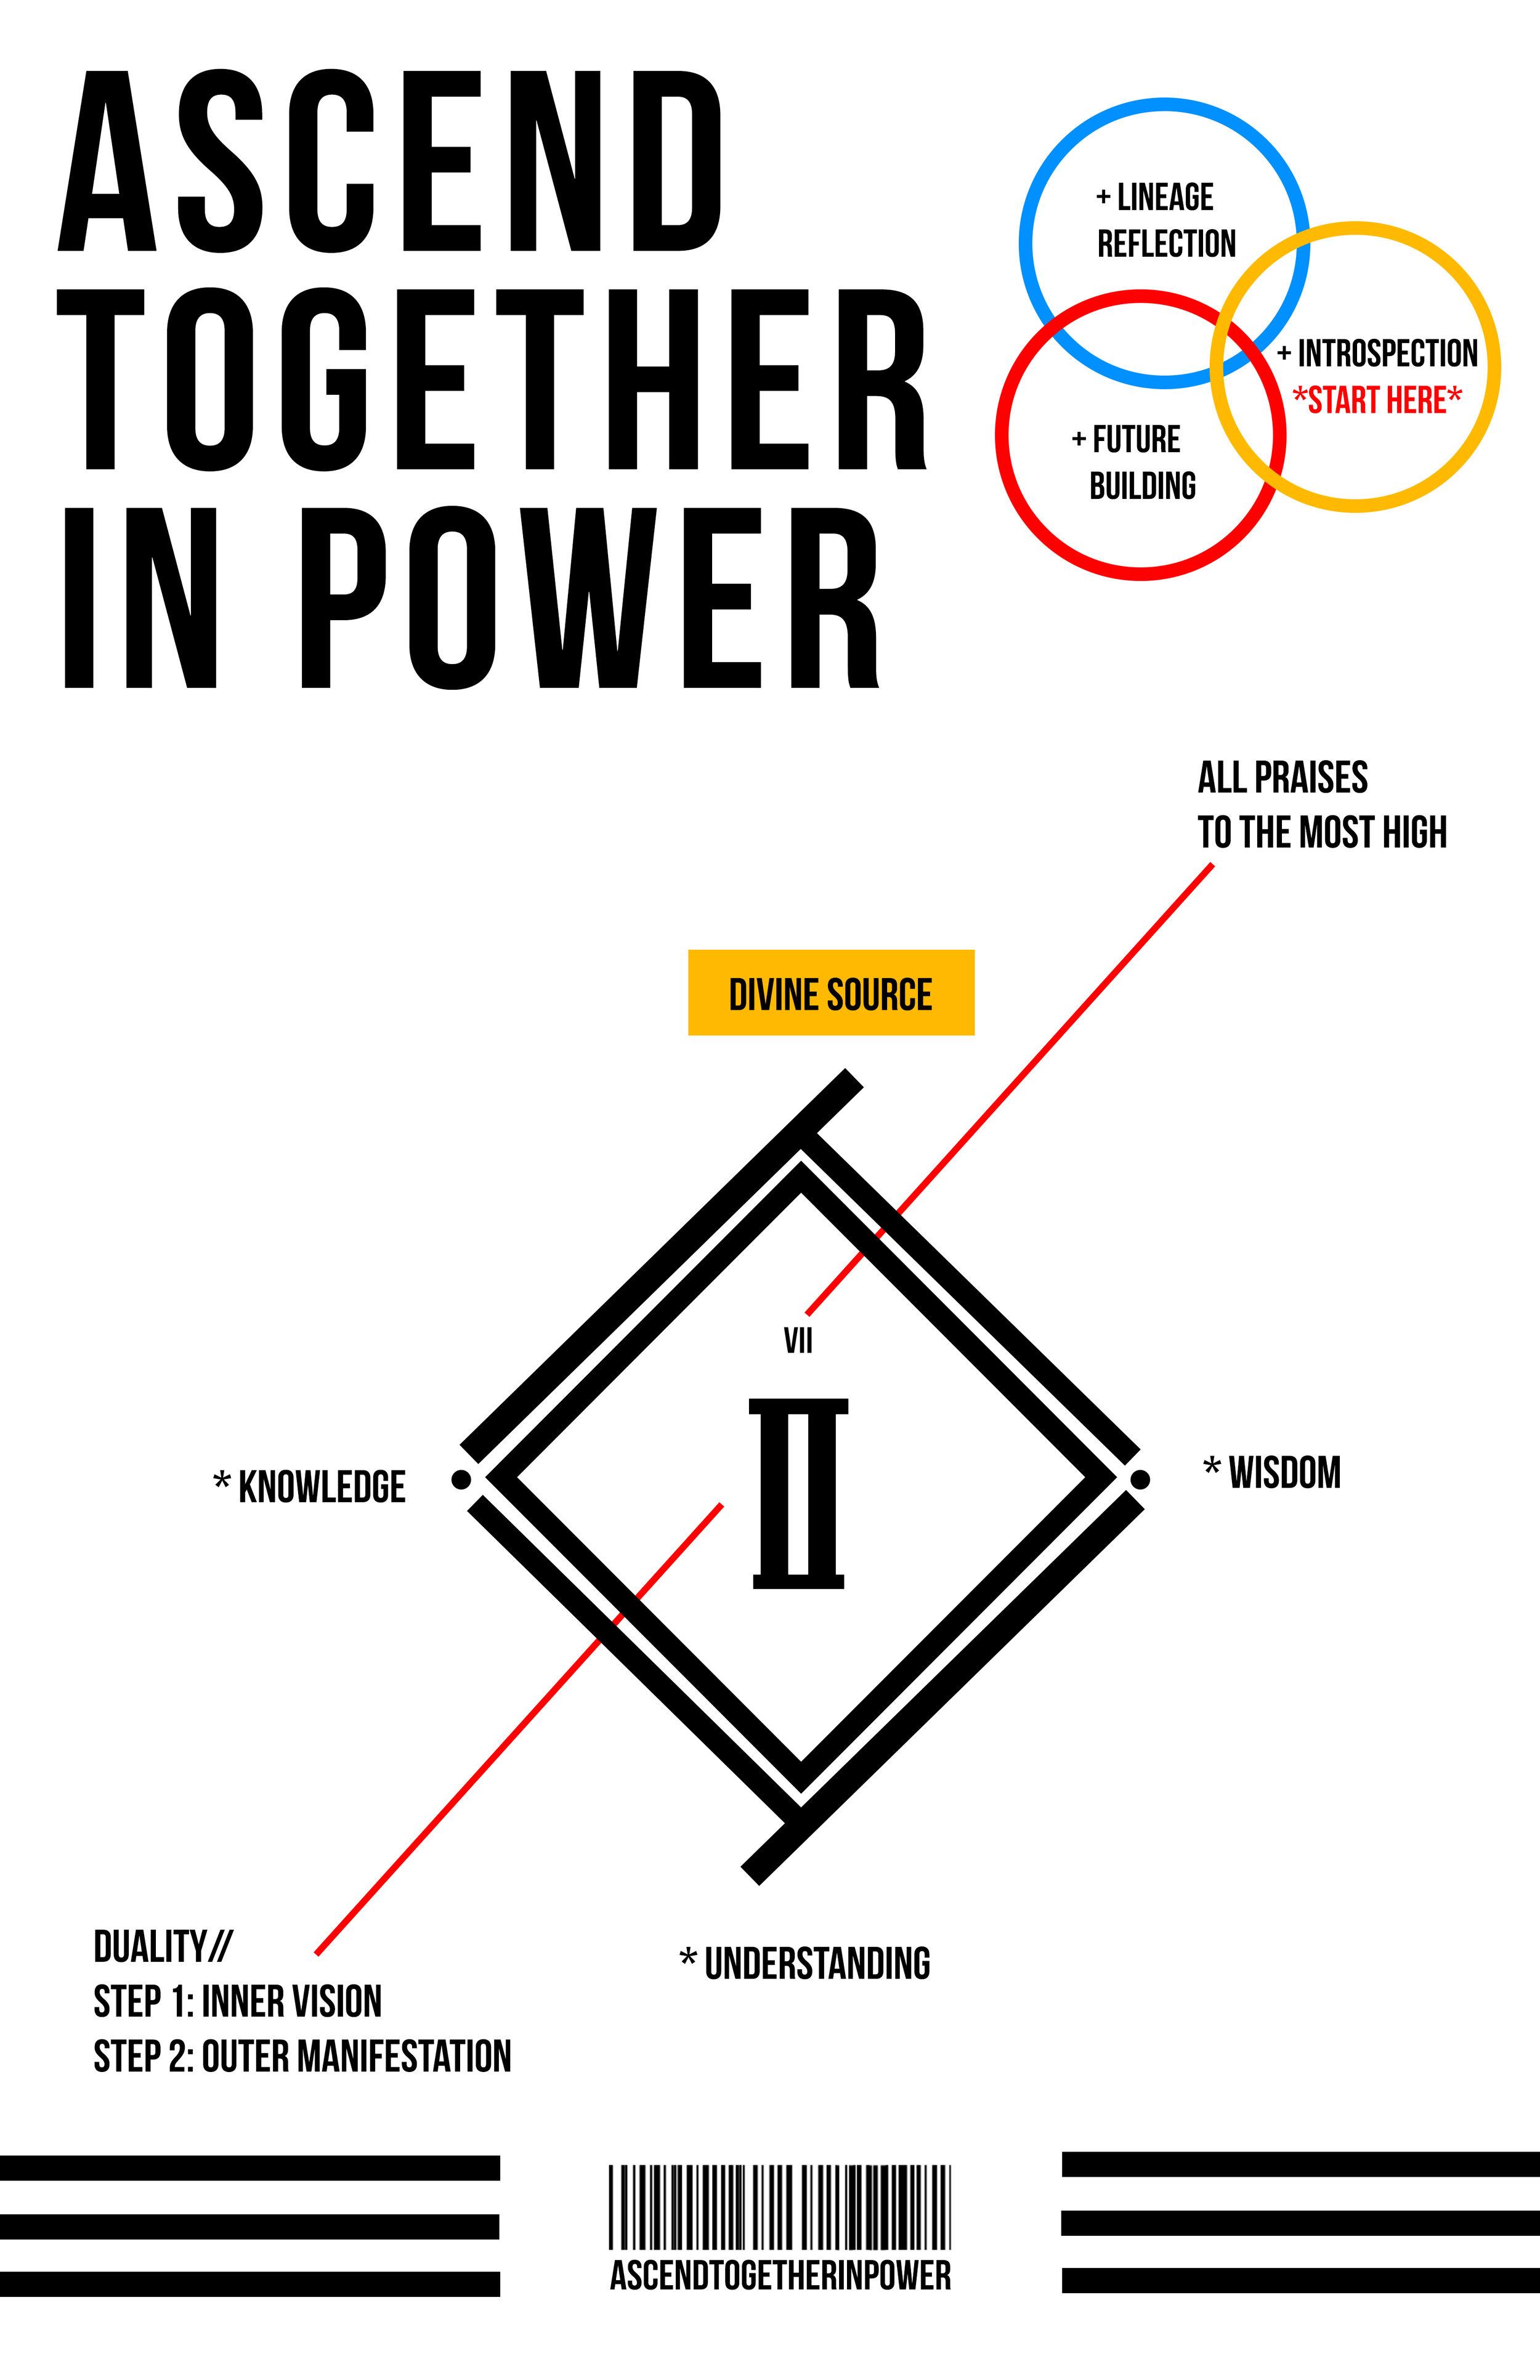 11X17 Poster.jpg